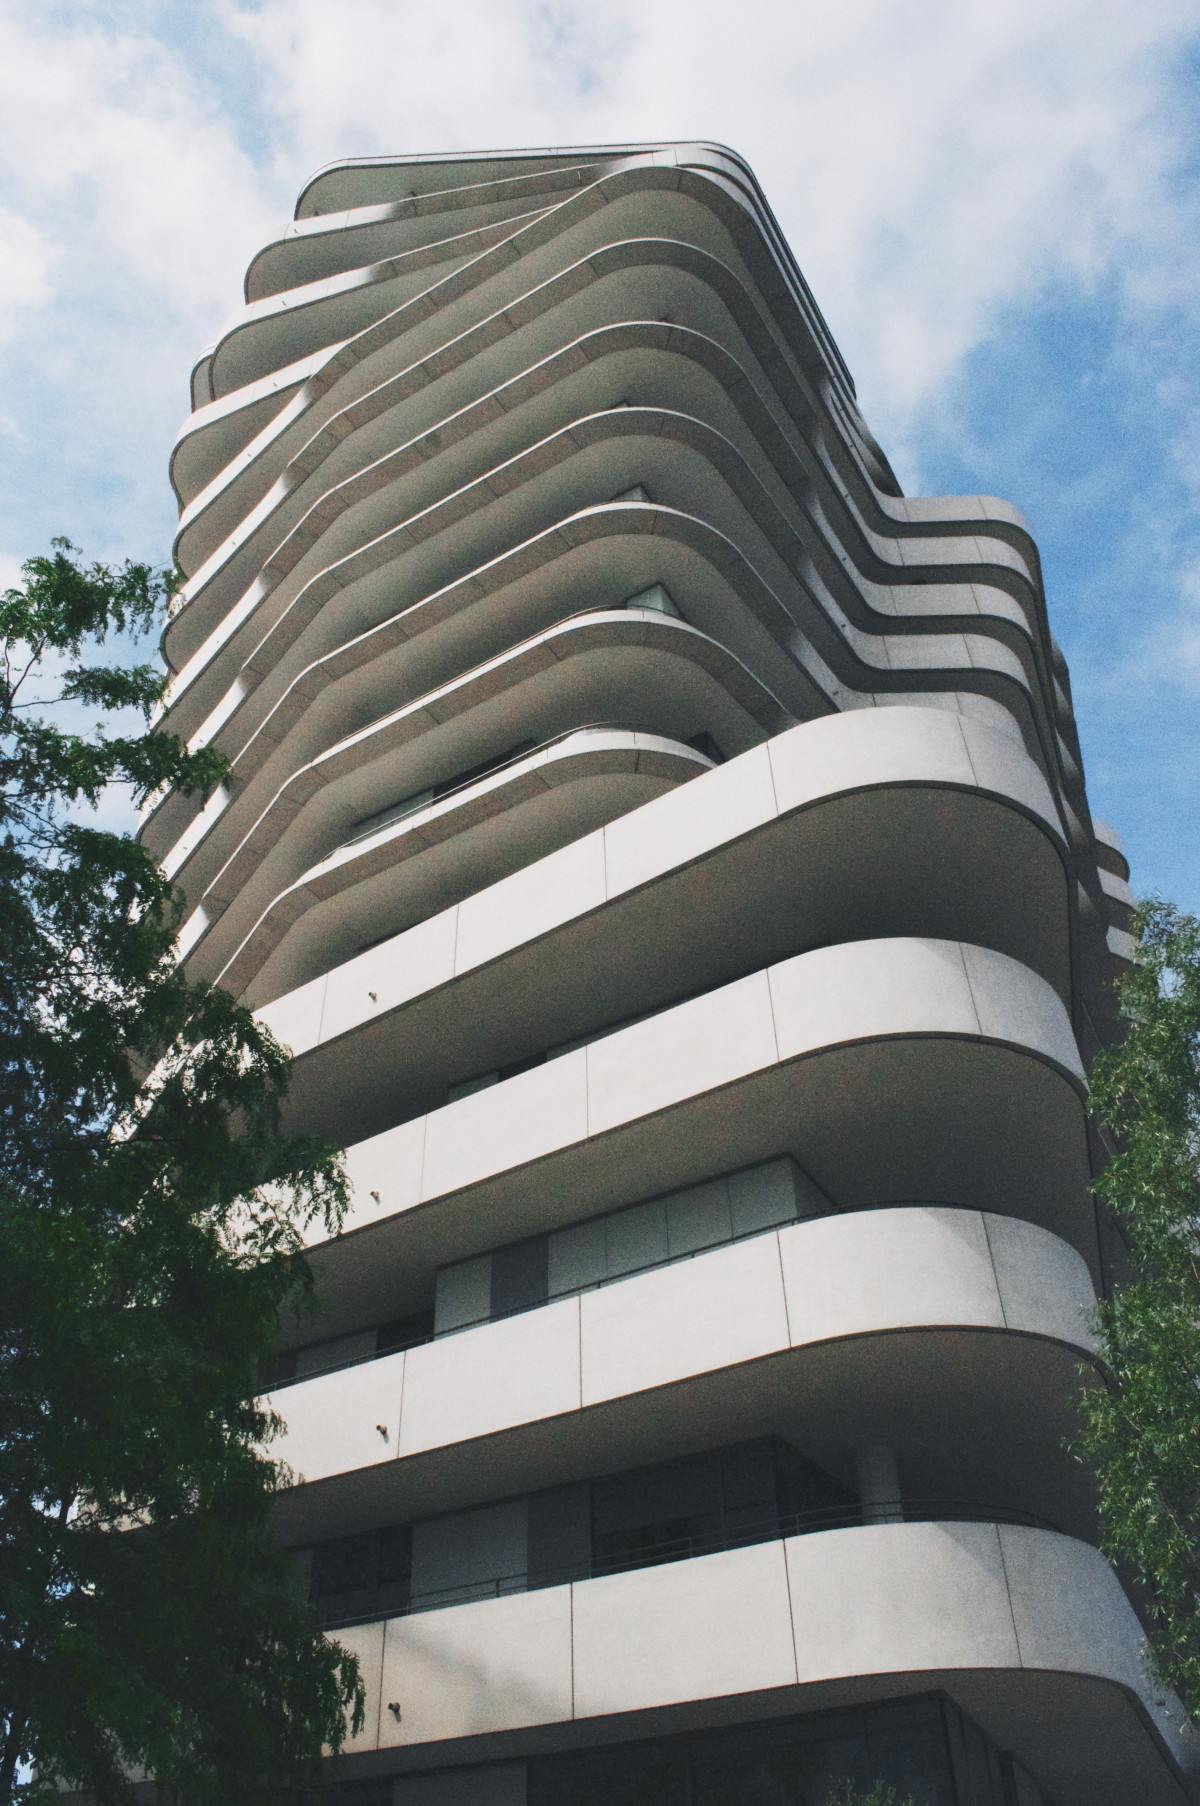 Free Images Skyscraper Line Landmark Facade Tower